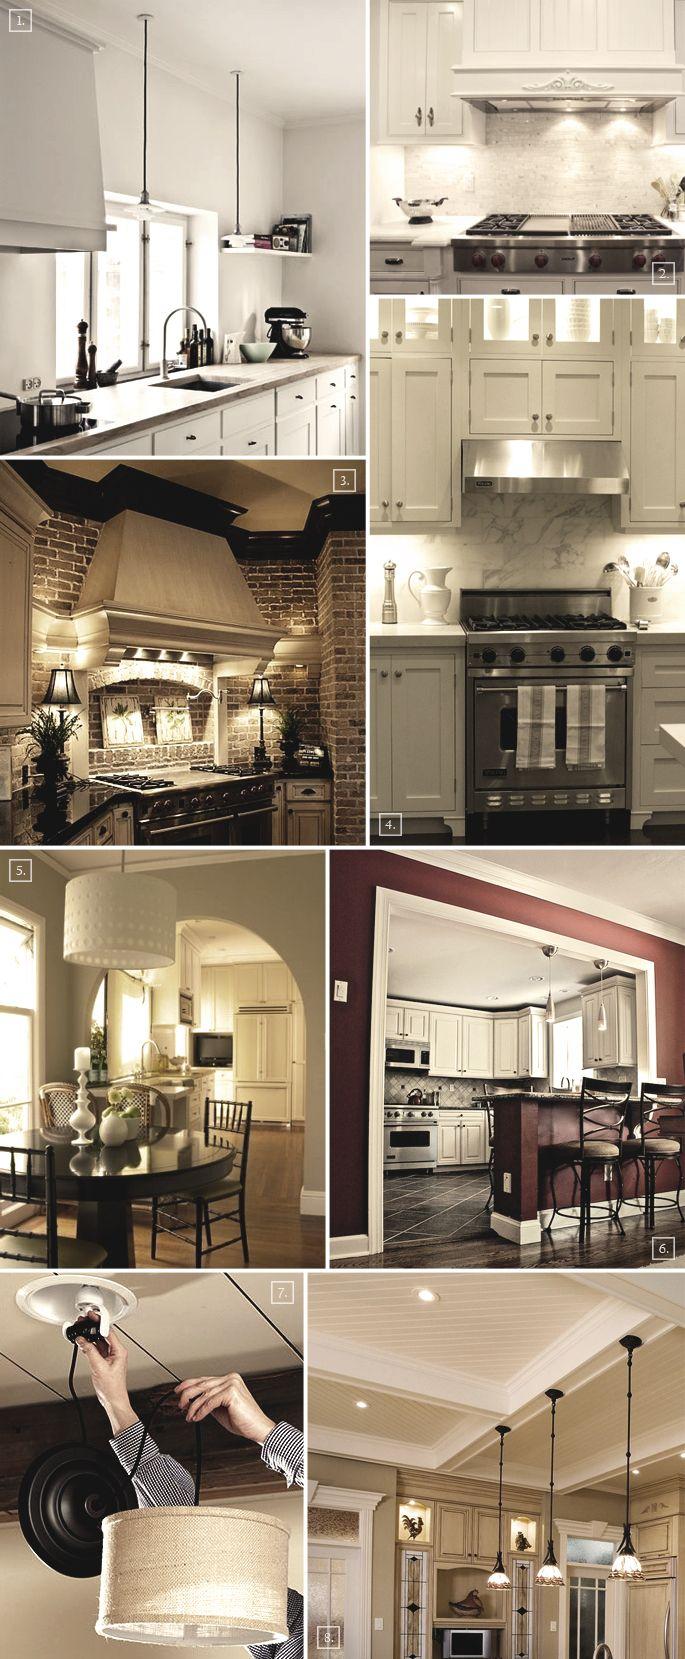 185 best kitchen inspiration images on pinterest kitchen kitchen lighting ideas mood board and inspiration